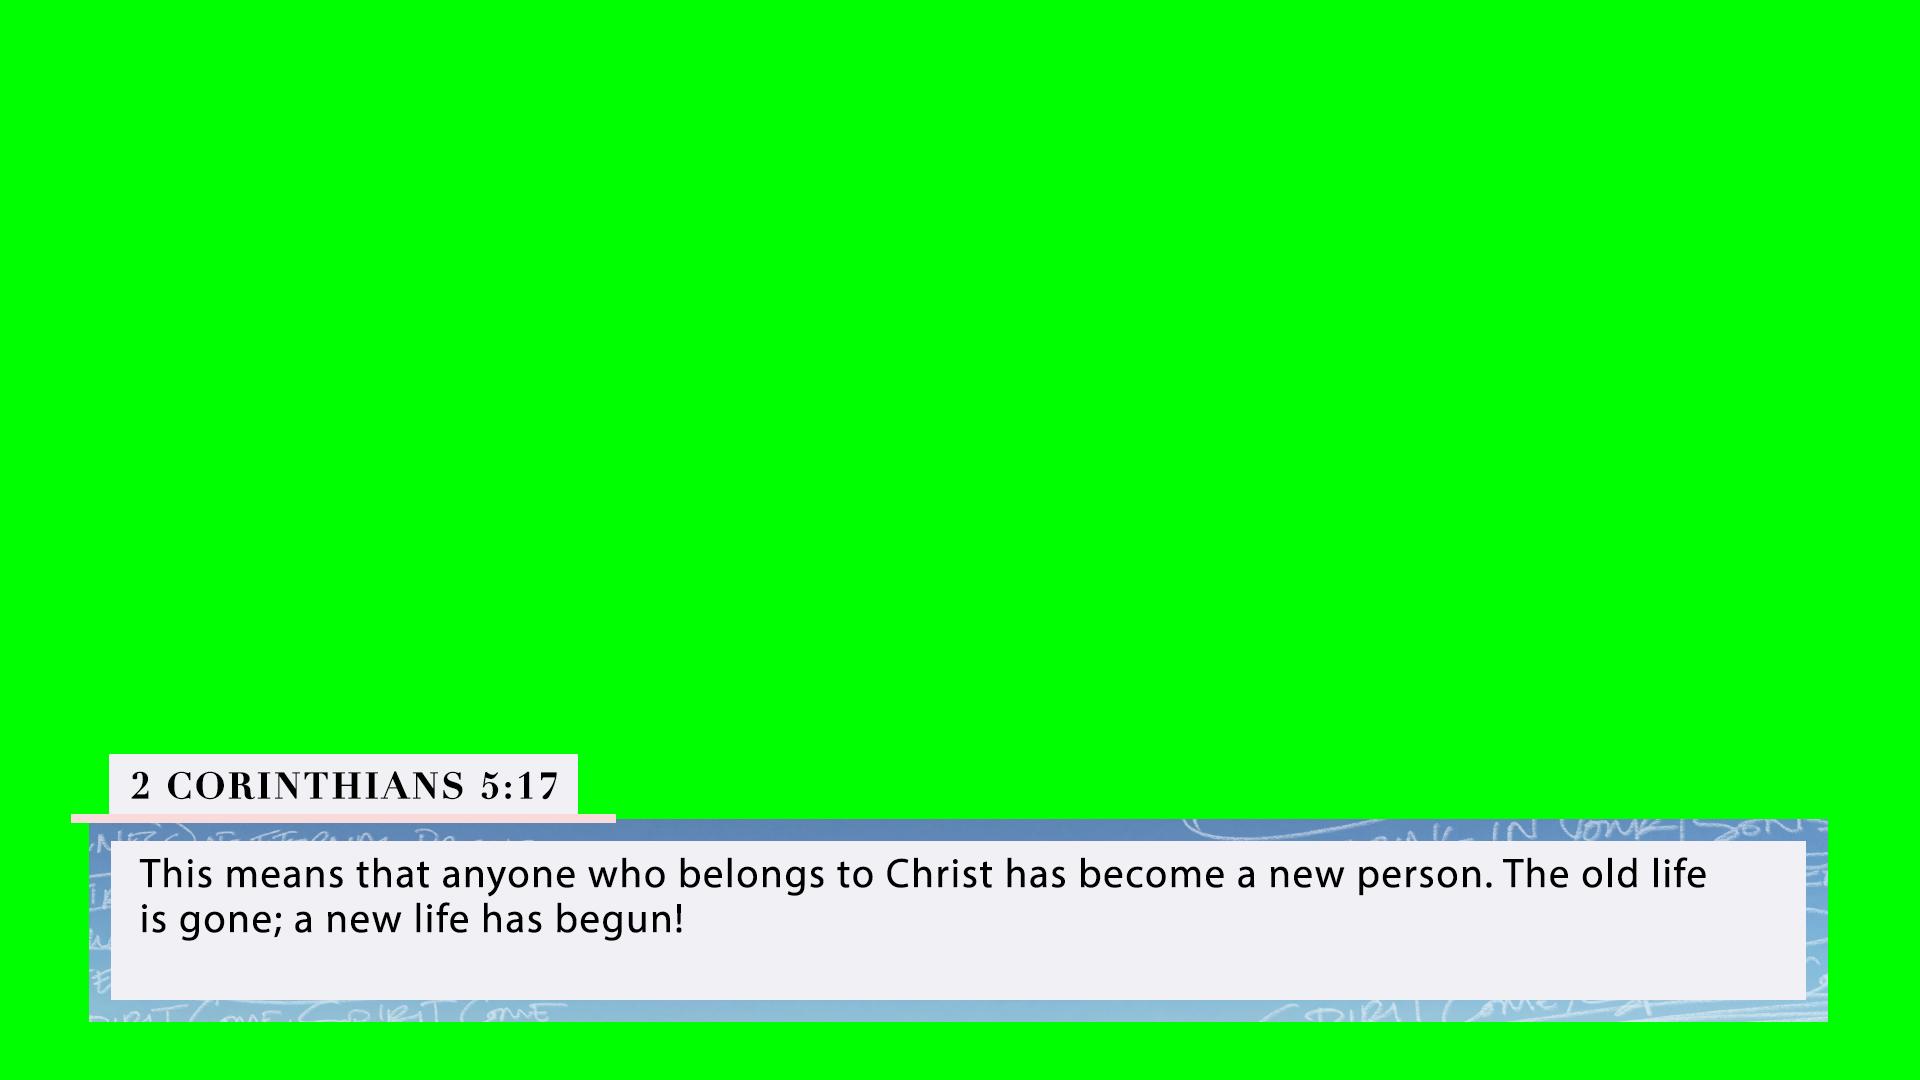 2 Corinthians 5:17 (PSD)